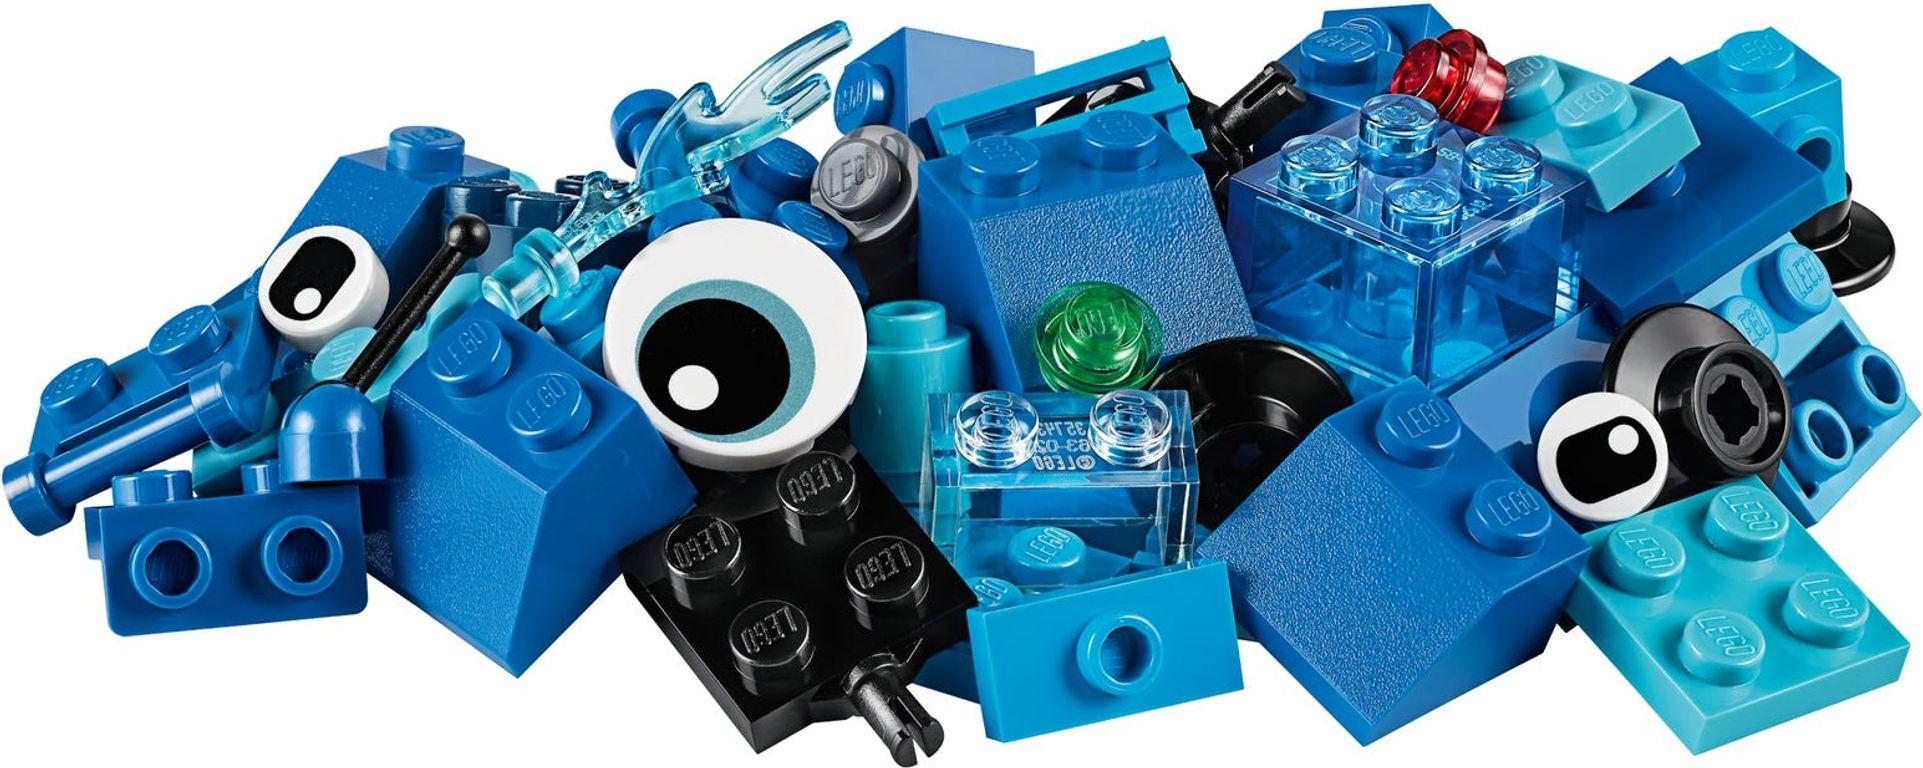 Creative Blue Bricks components